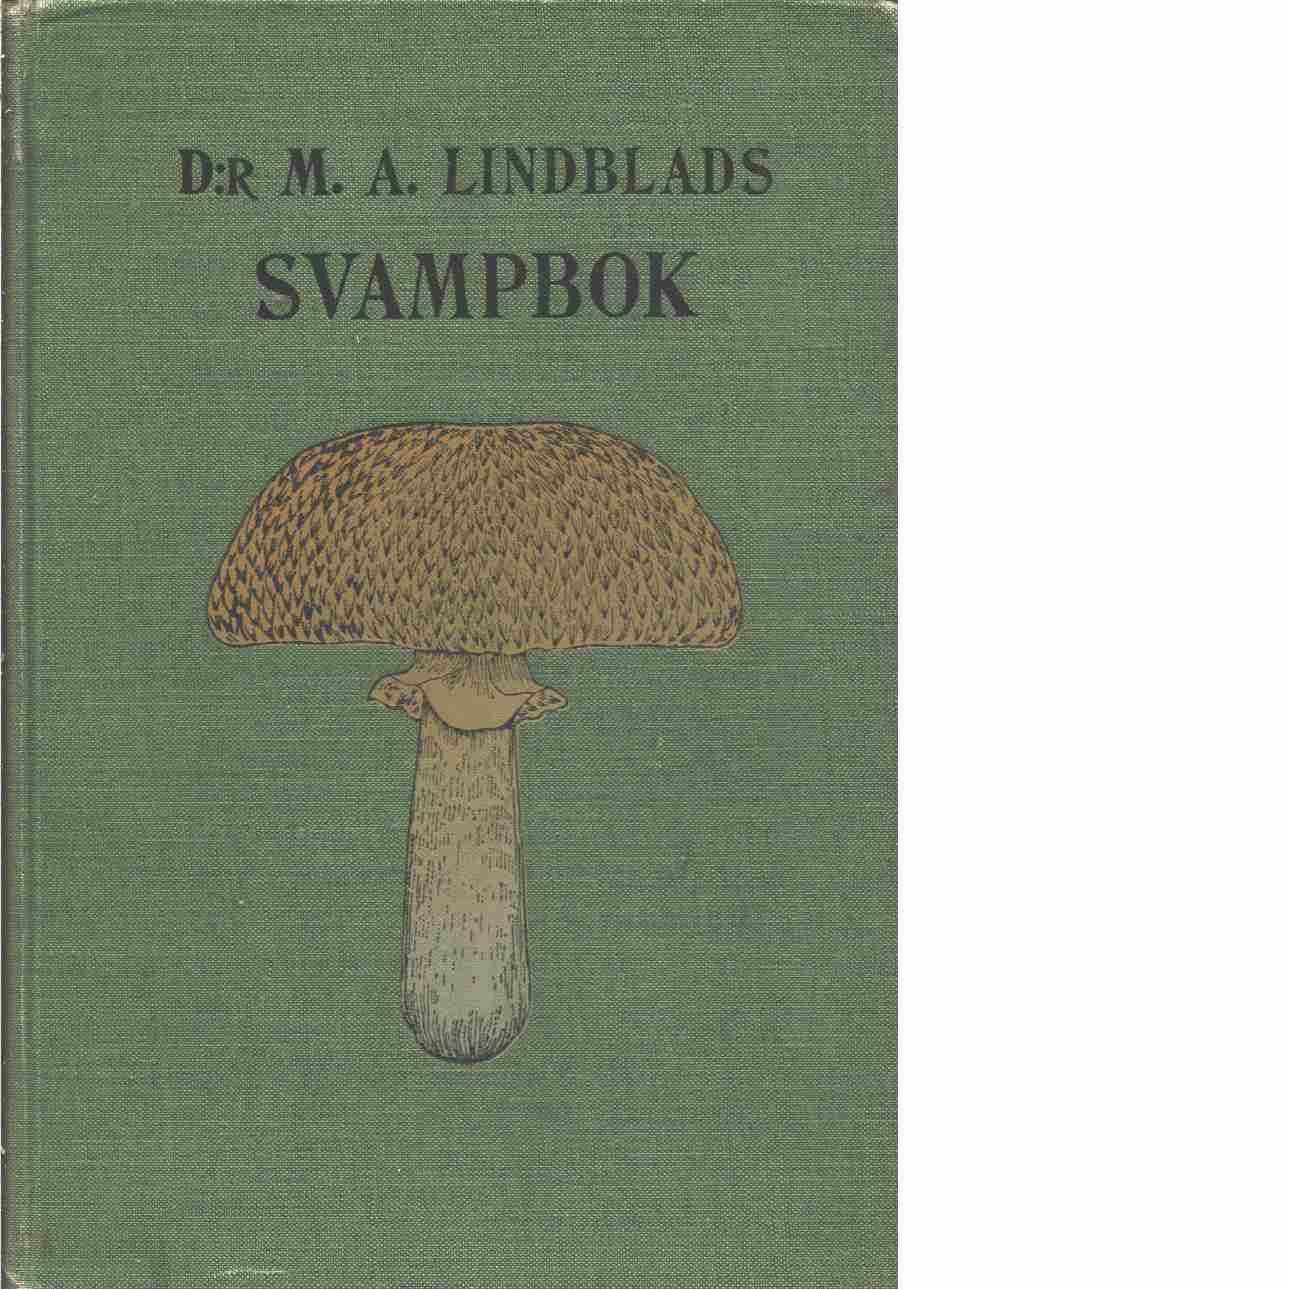 D:r M. A. Lindblads Svampbok - Lindblad, M. A.